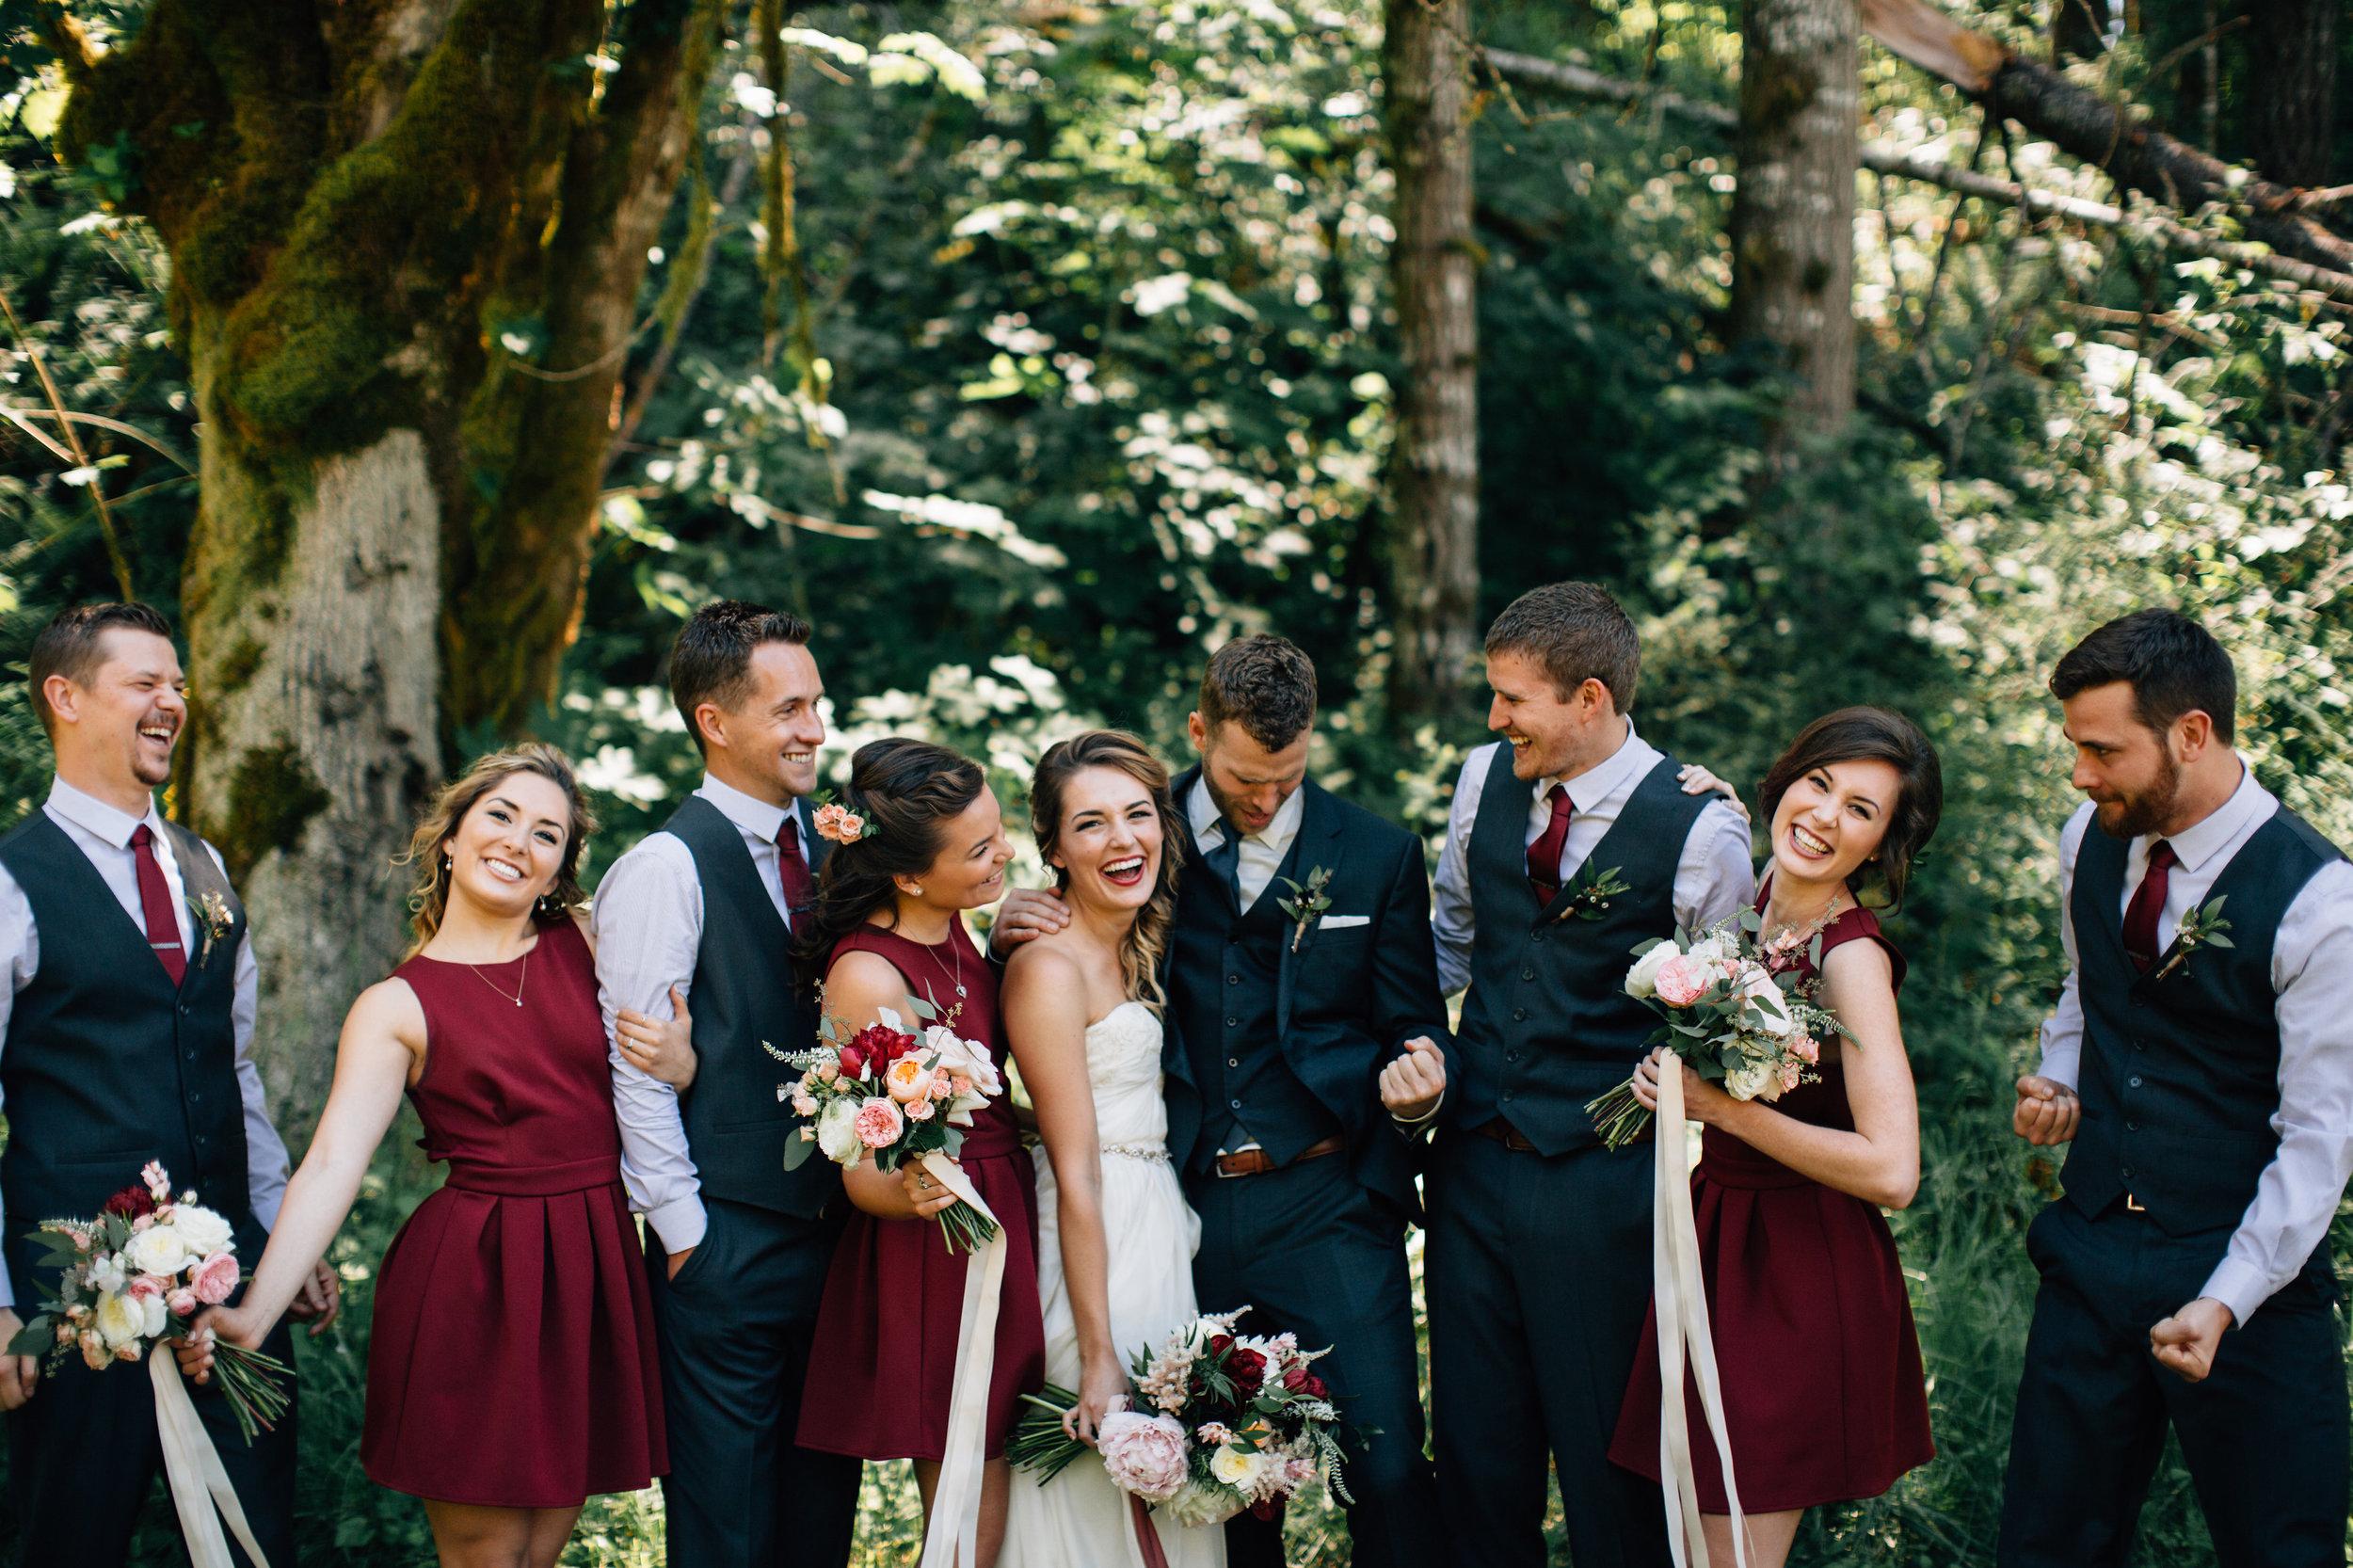 WIlamette Valley barn wedding